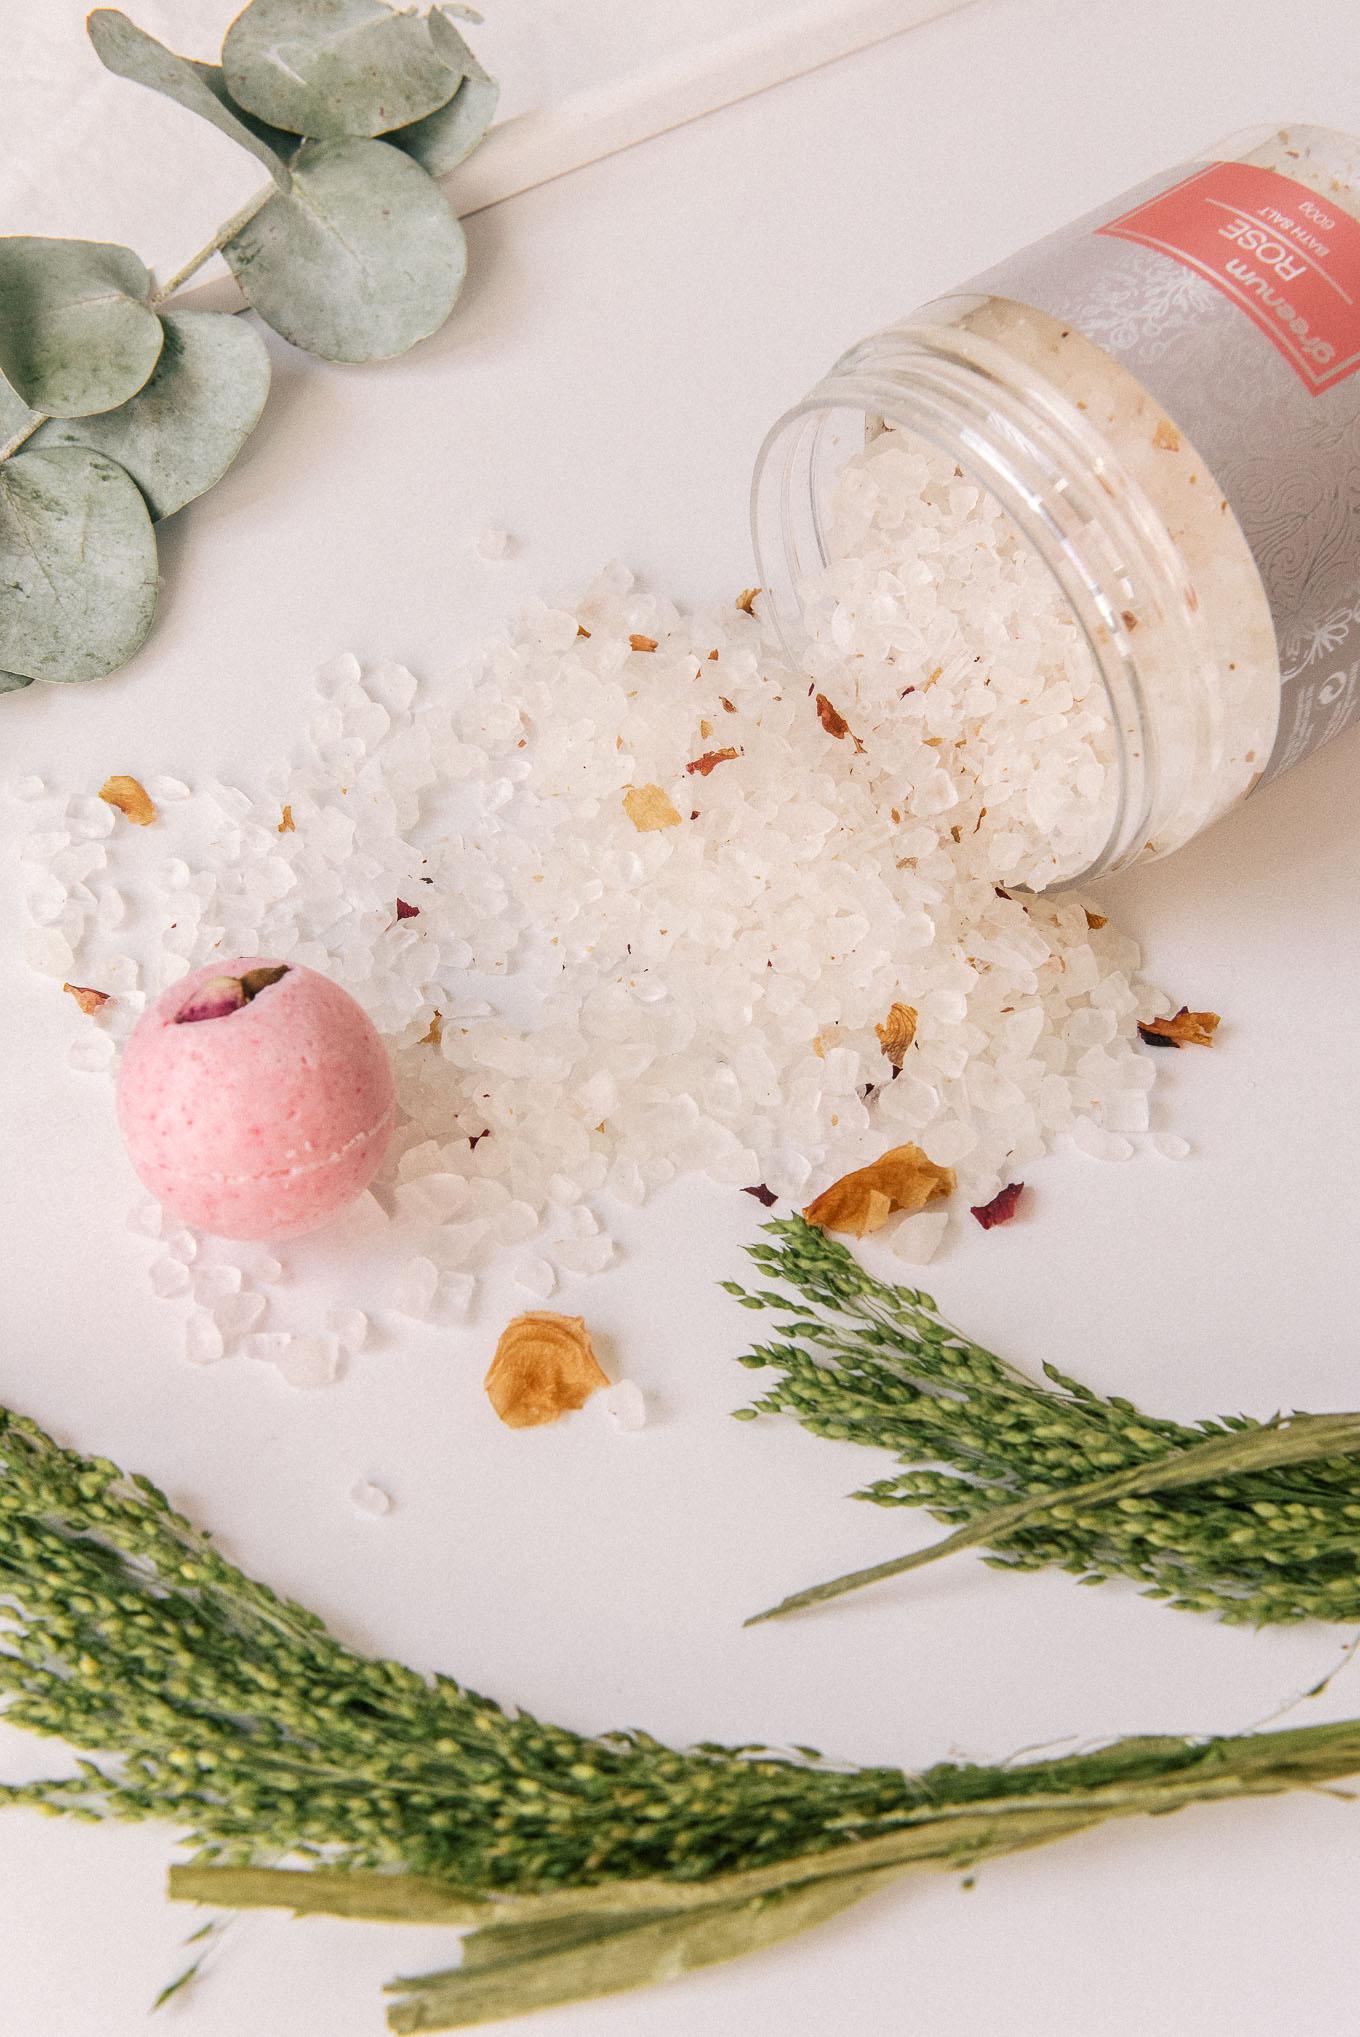 Rose bath salt for valentines day